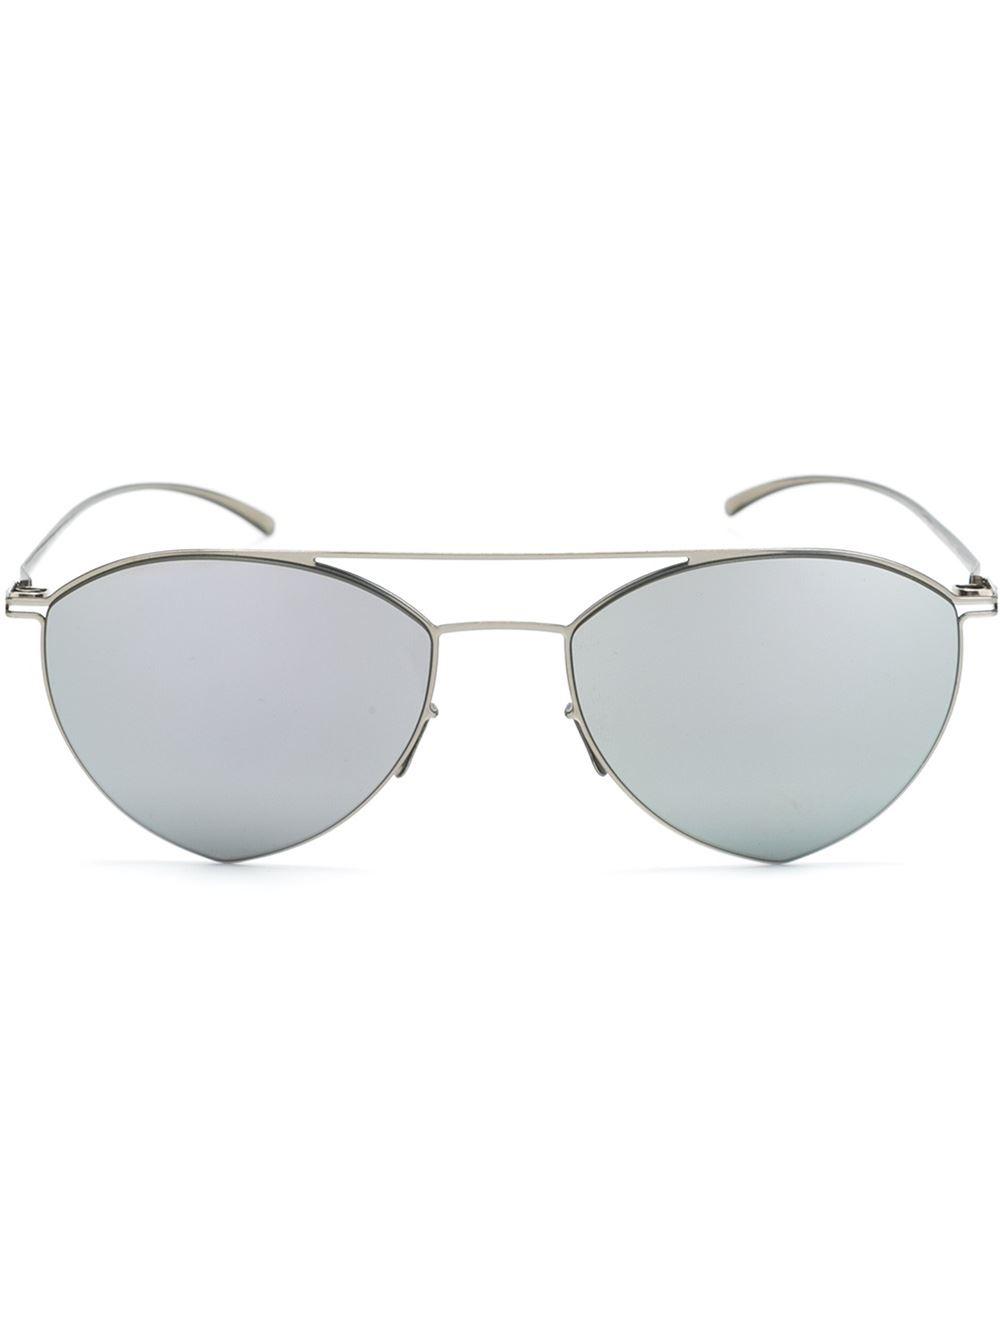 Mykita x Maison Margiela square sunglasses - Metallic Mykita 14kEbMsPwB